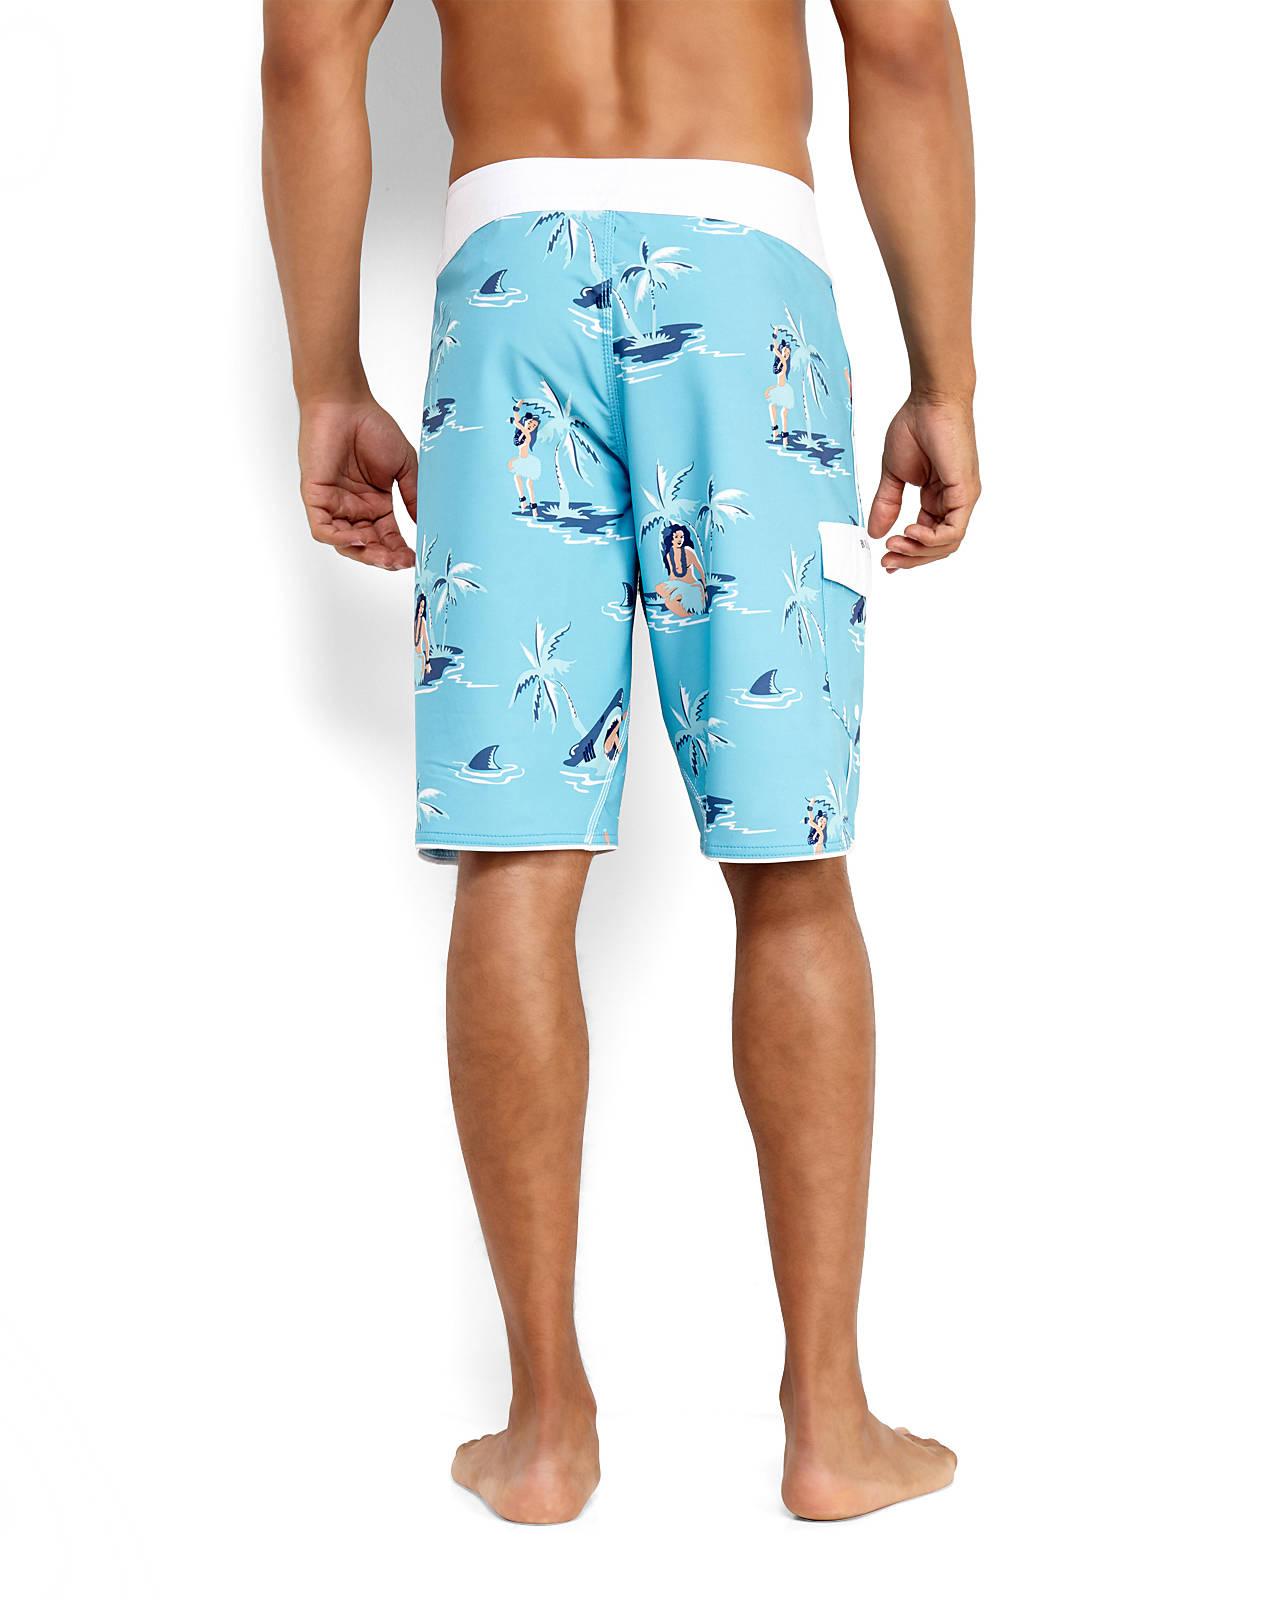 Mens Swim Surf/ Board Shorts by Le Shark 'Juanita' Mesh ... |Shark Board Shorts For Men